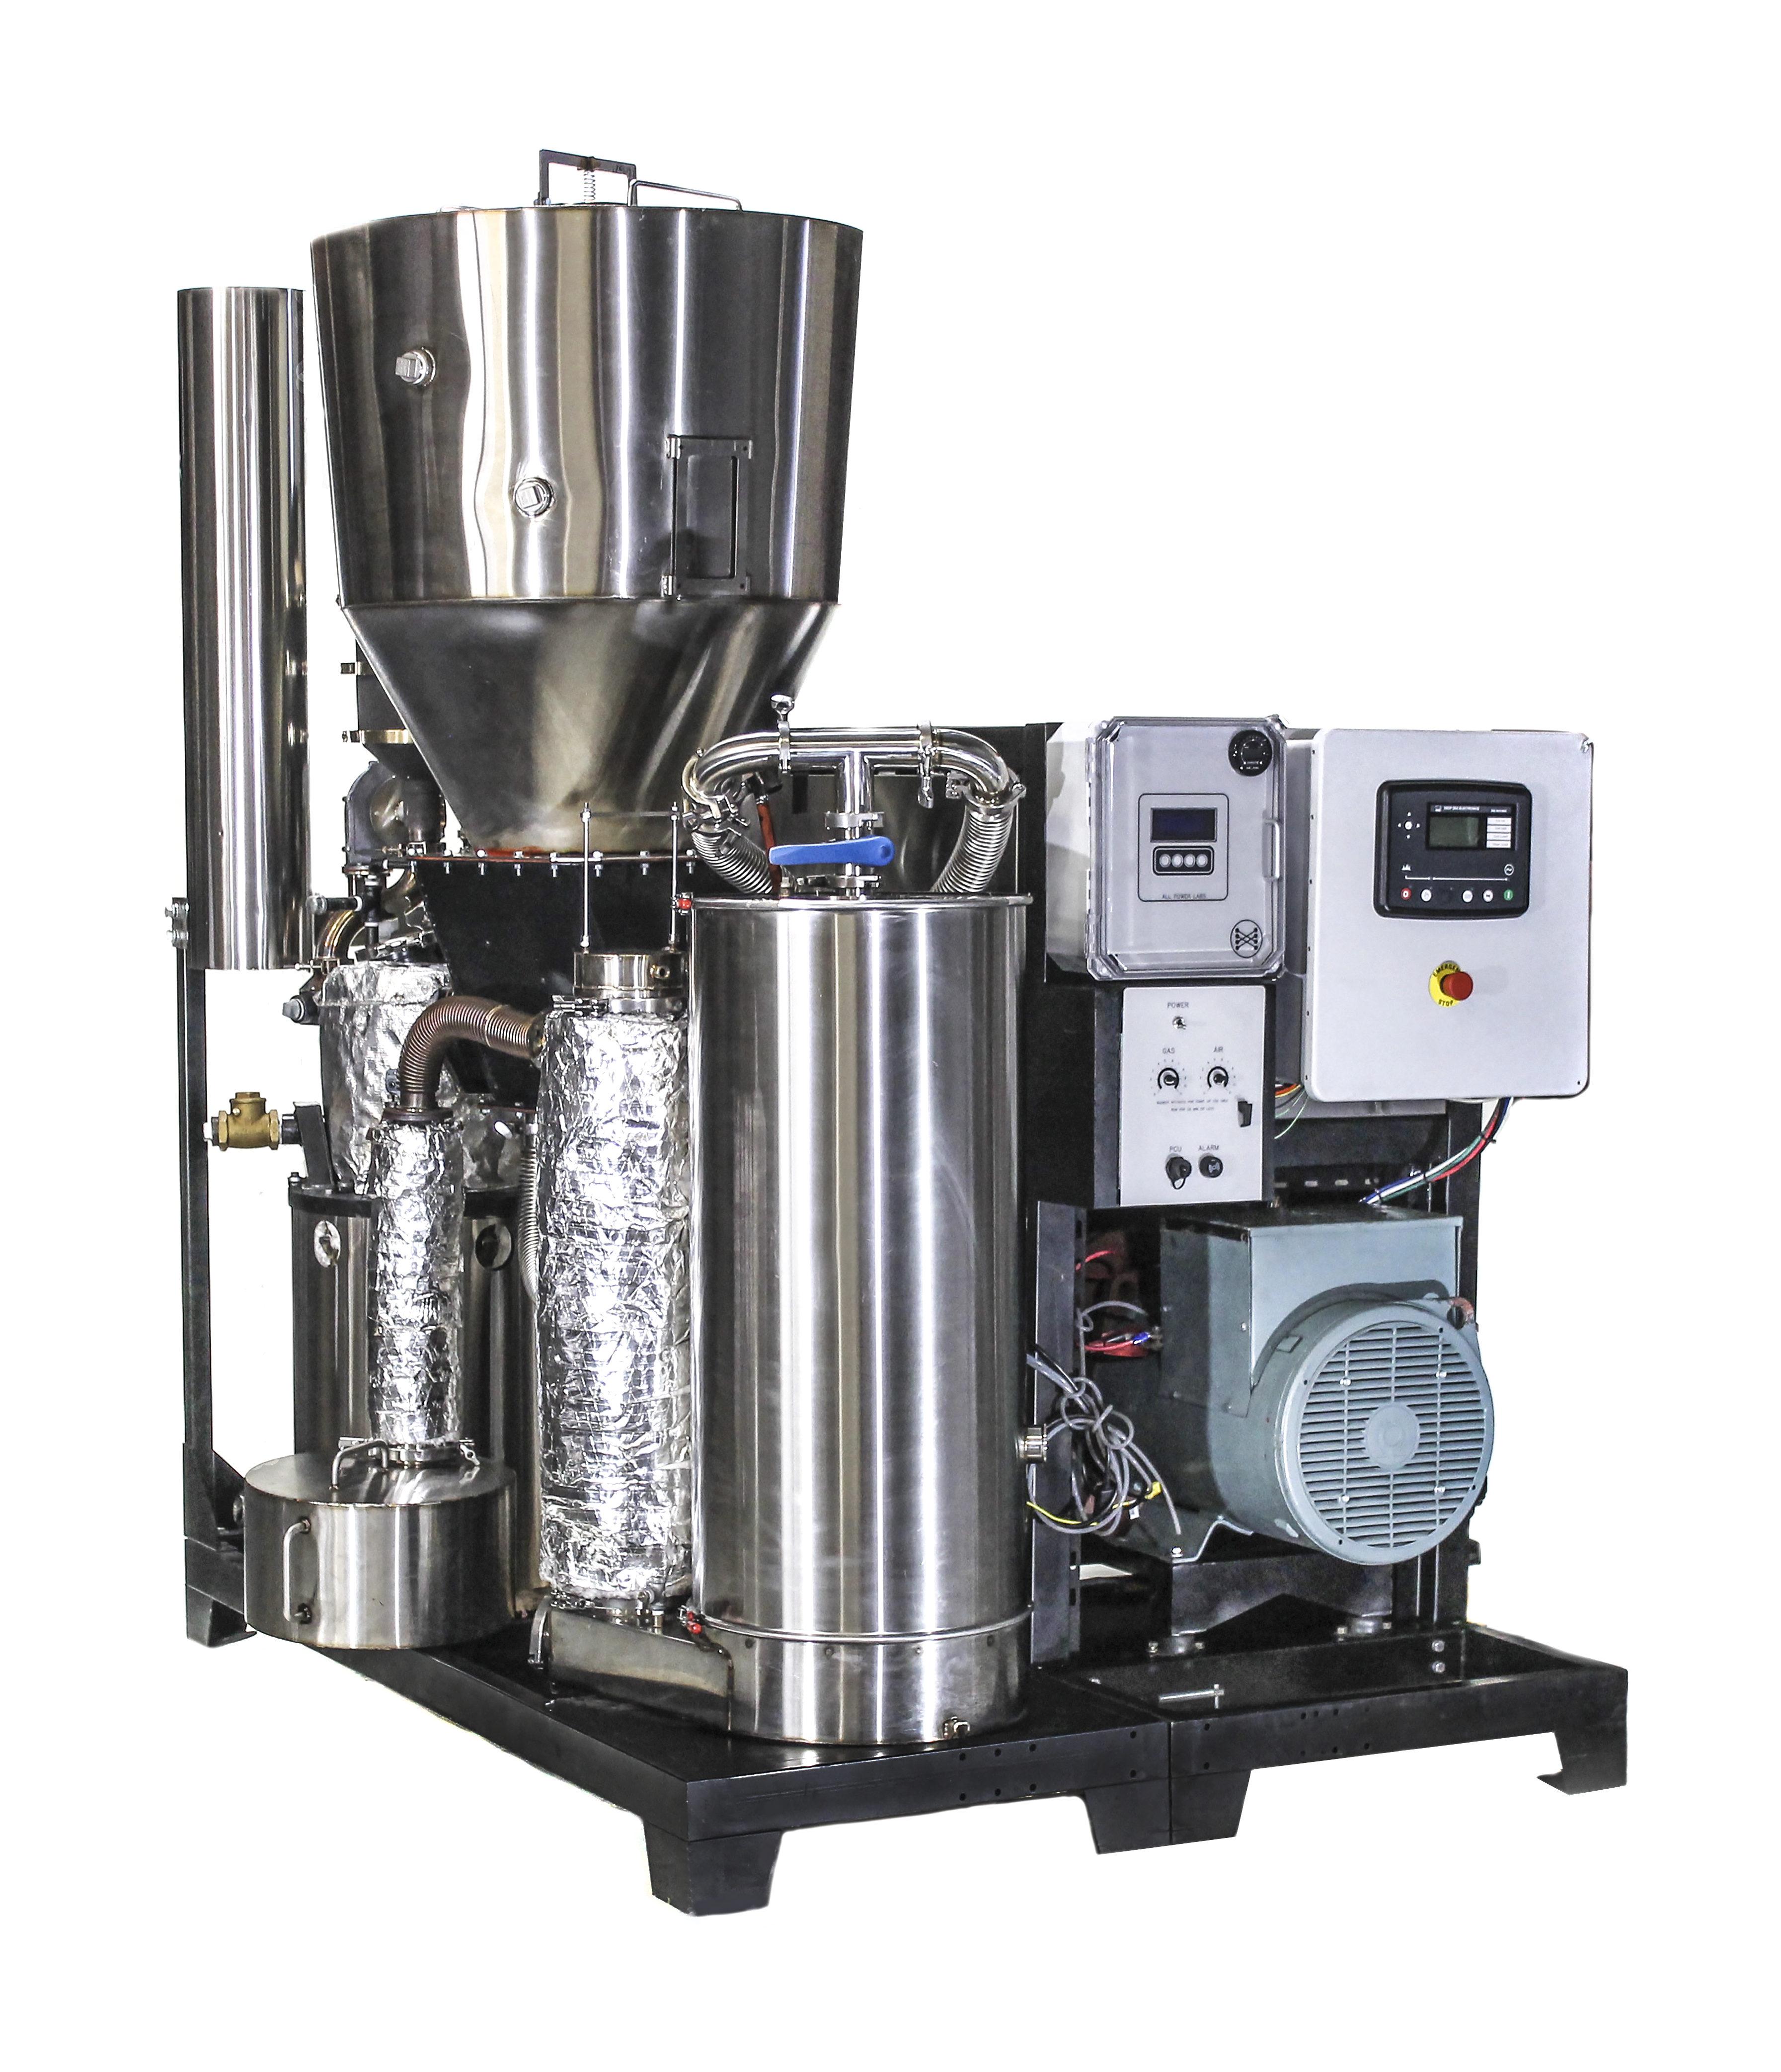 PP30 Power Pallet gasifier genset photo,